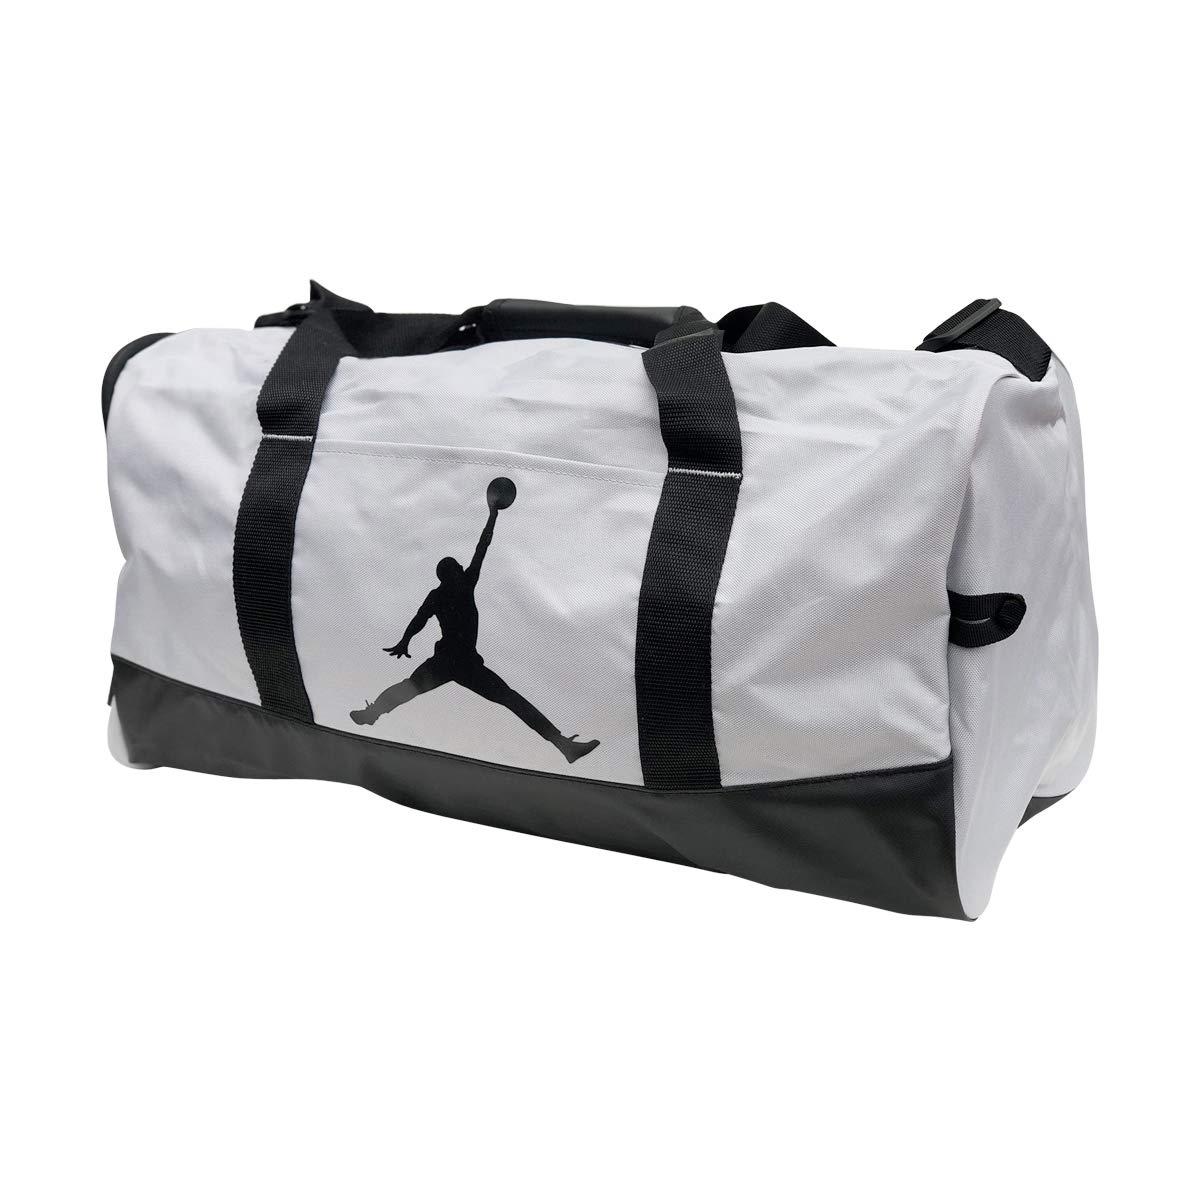 Nike Air Jordan Jumpman Duffel Sports Gym Bag 8A1913 Wet/Dry Shoe Pocket Water Resistant (Grey/Black)